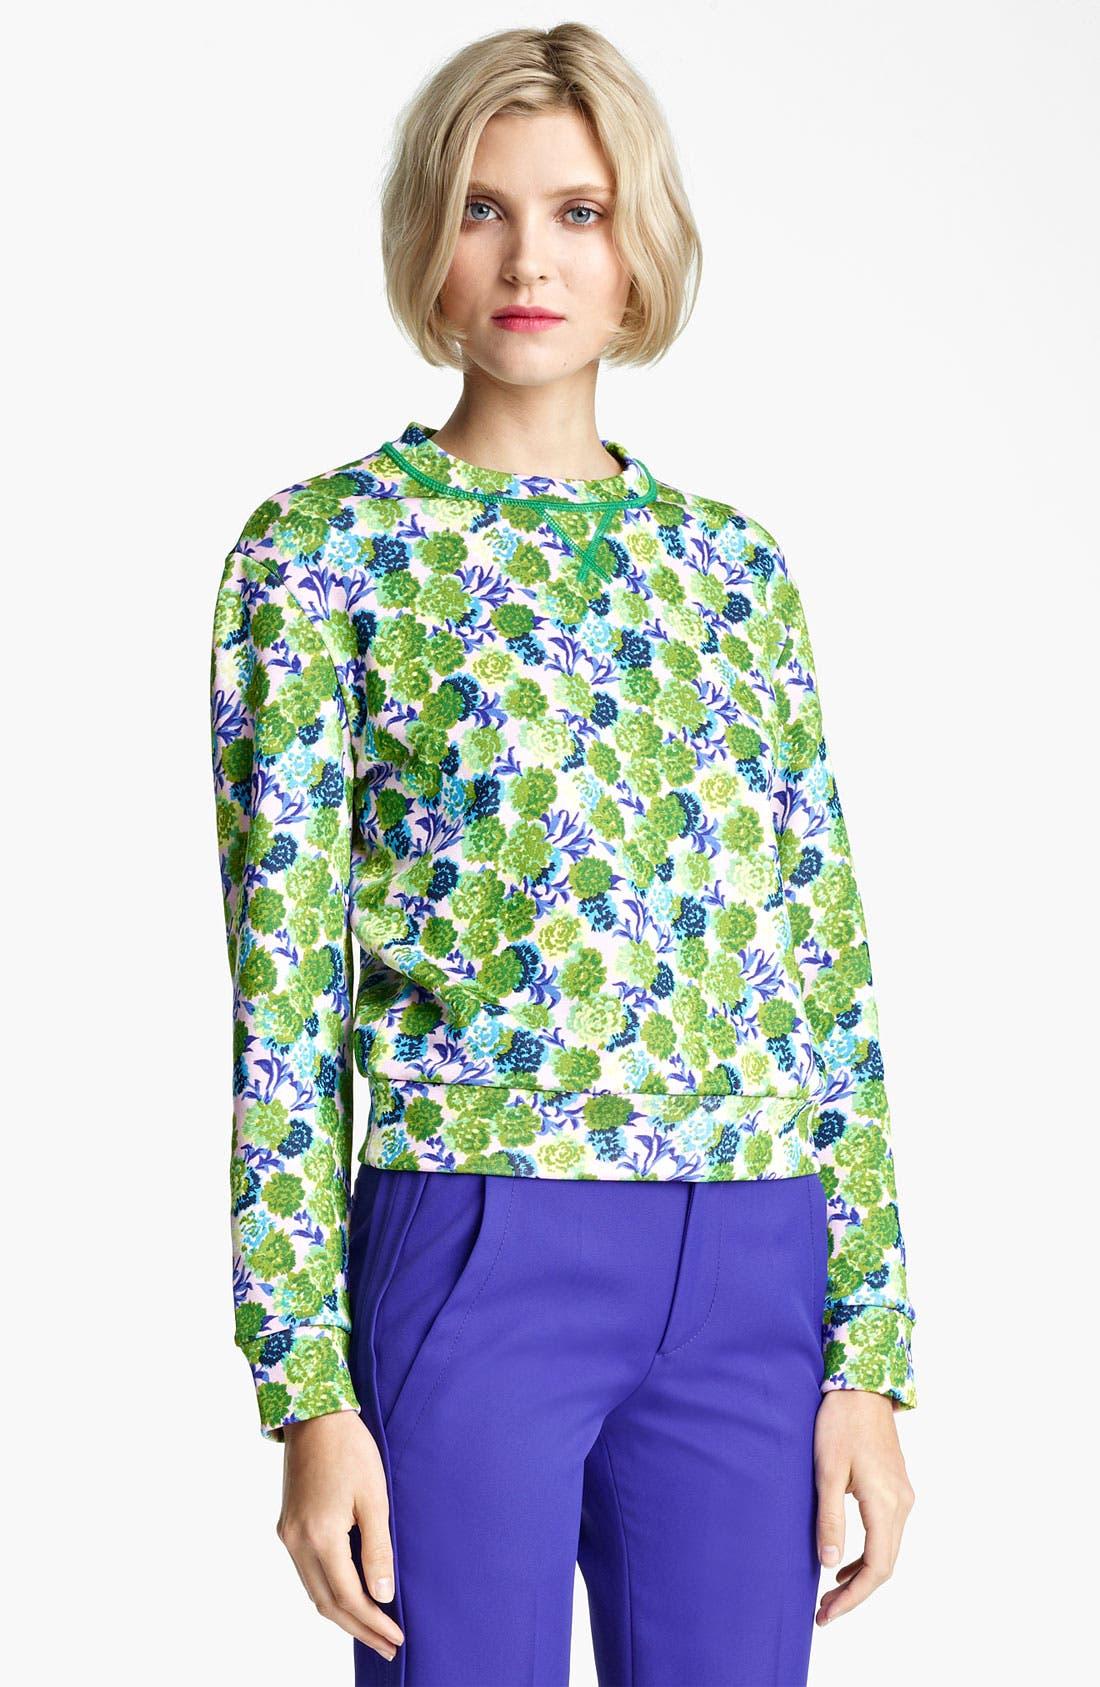 Alternate Image 1 Selected - MARC JACOBS Floral Print Sweatshirt